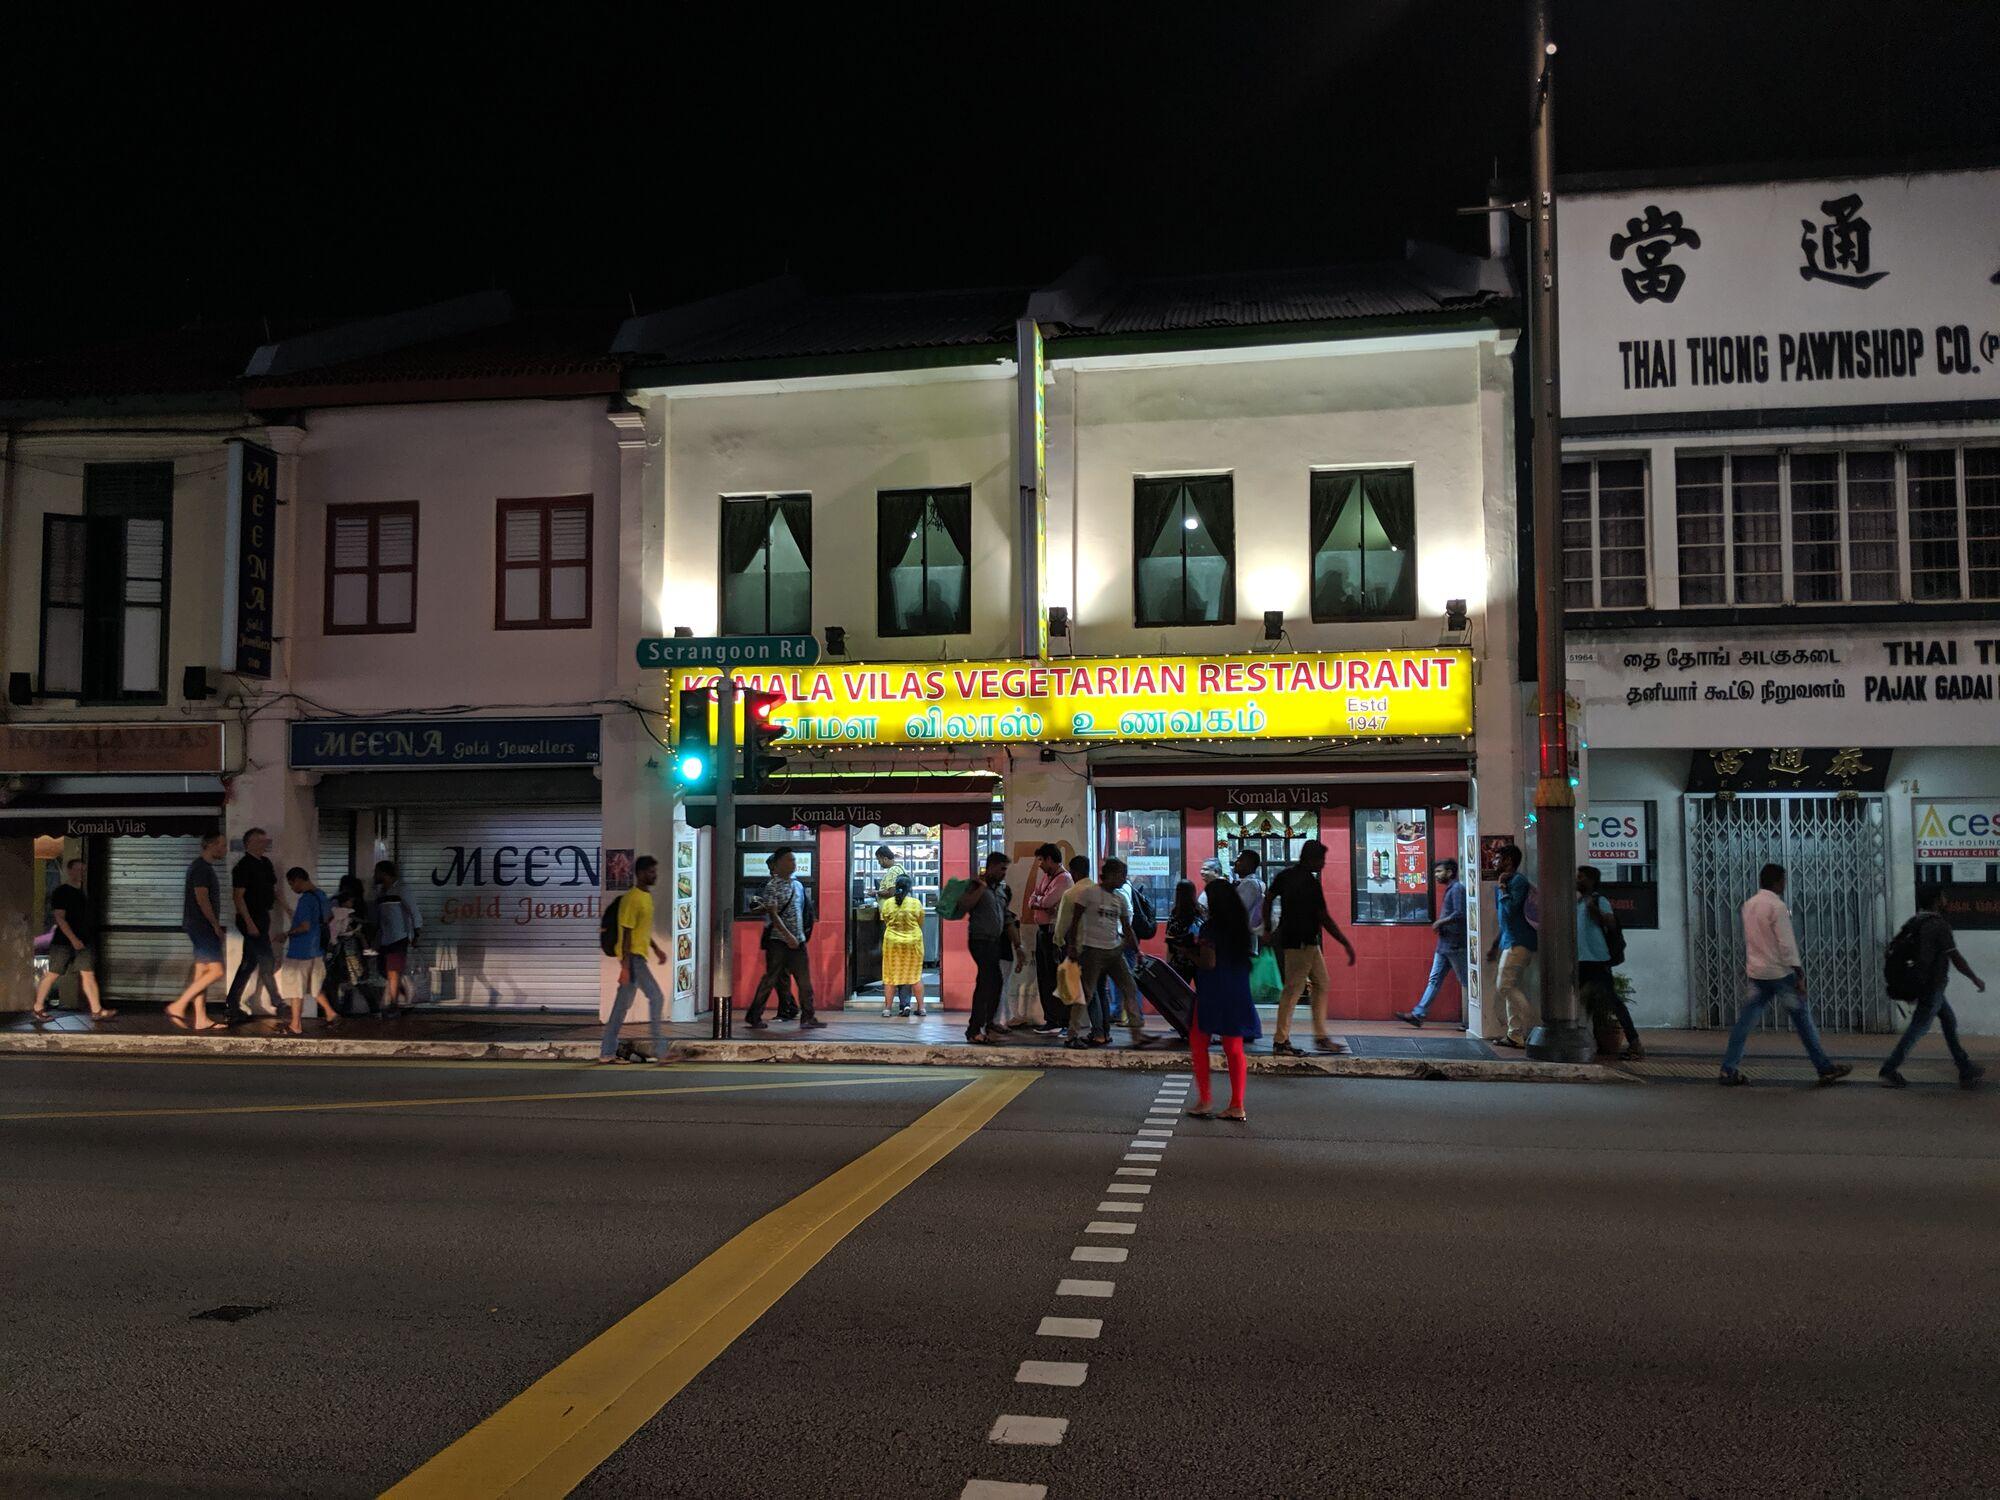 The legendary Komala Vilas Vegetarian Restaurant, Serangoon Road, Singapore